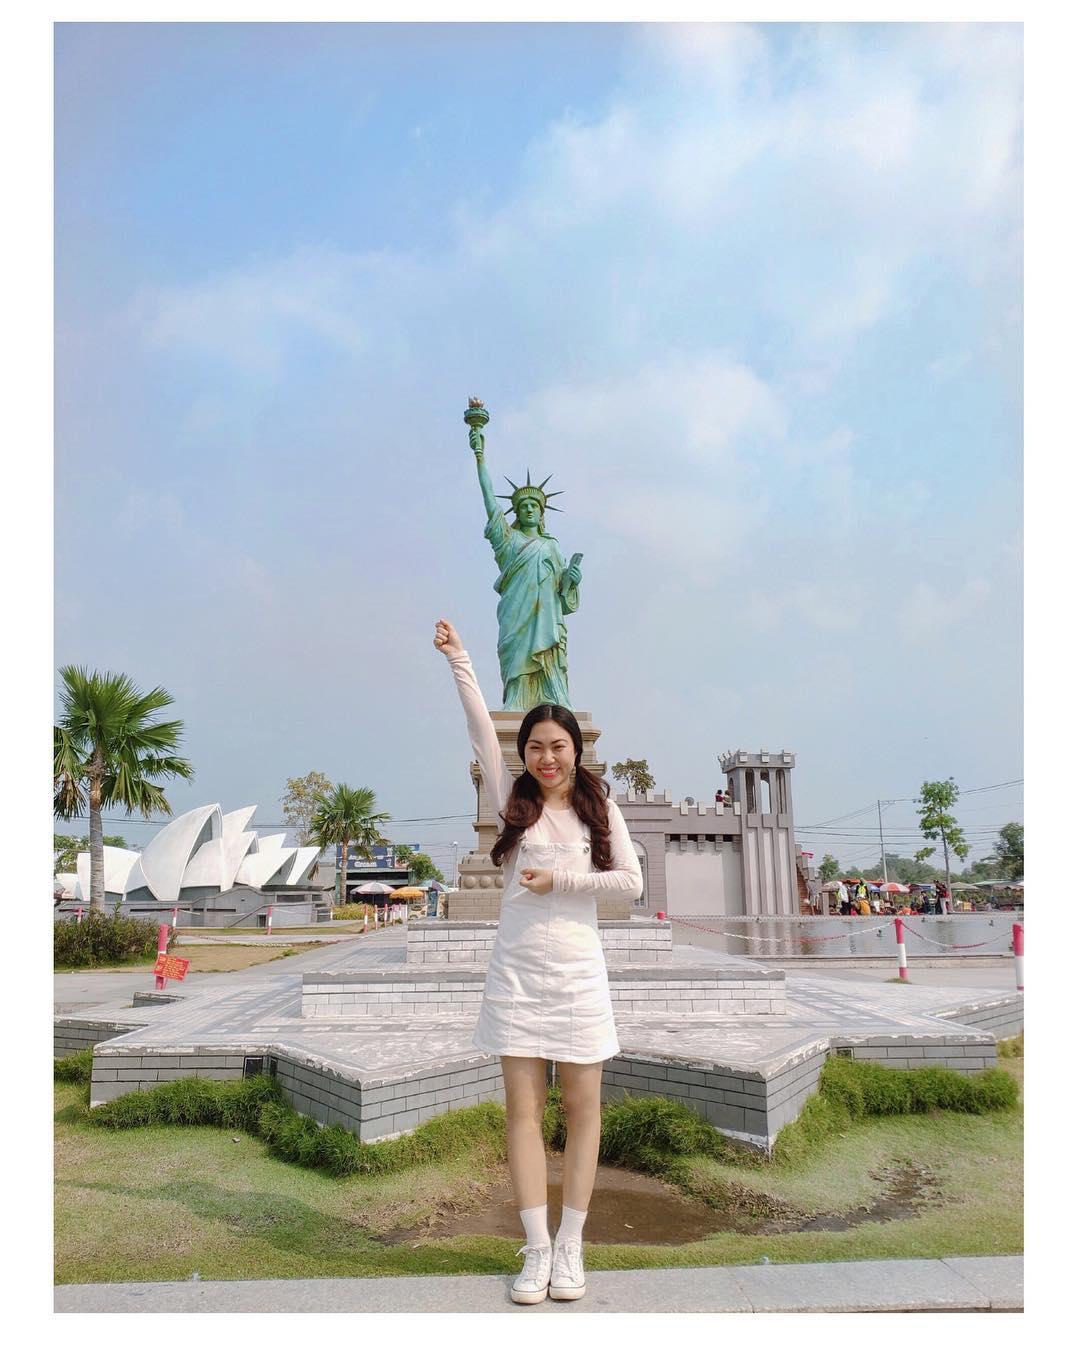 longan_cong-vien-7-ky-quan-the-gioi-01